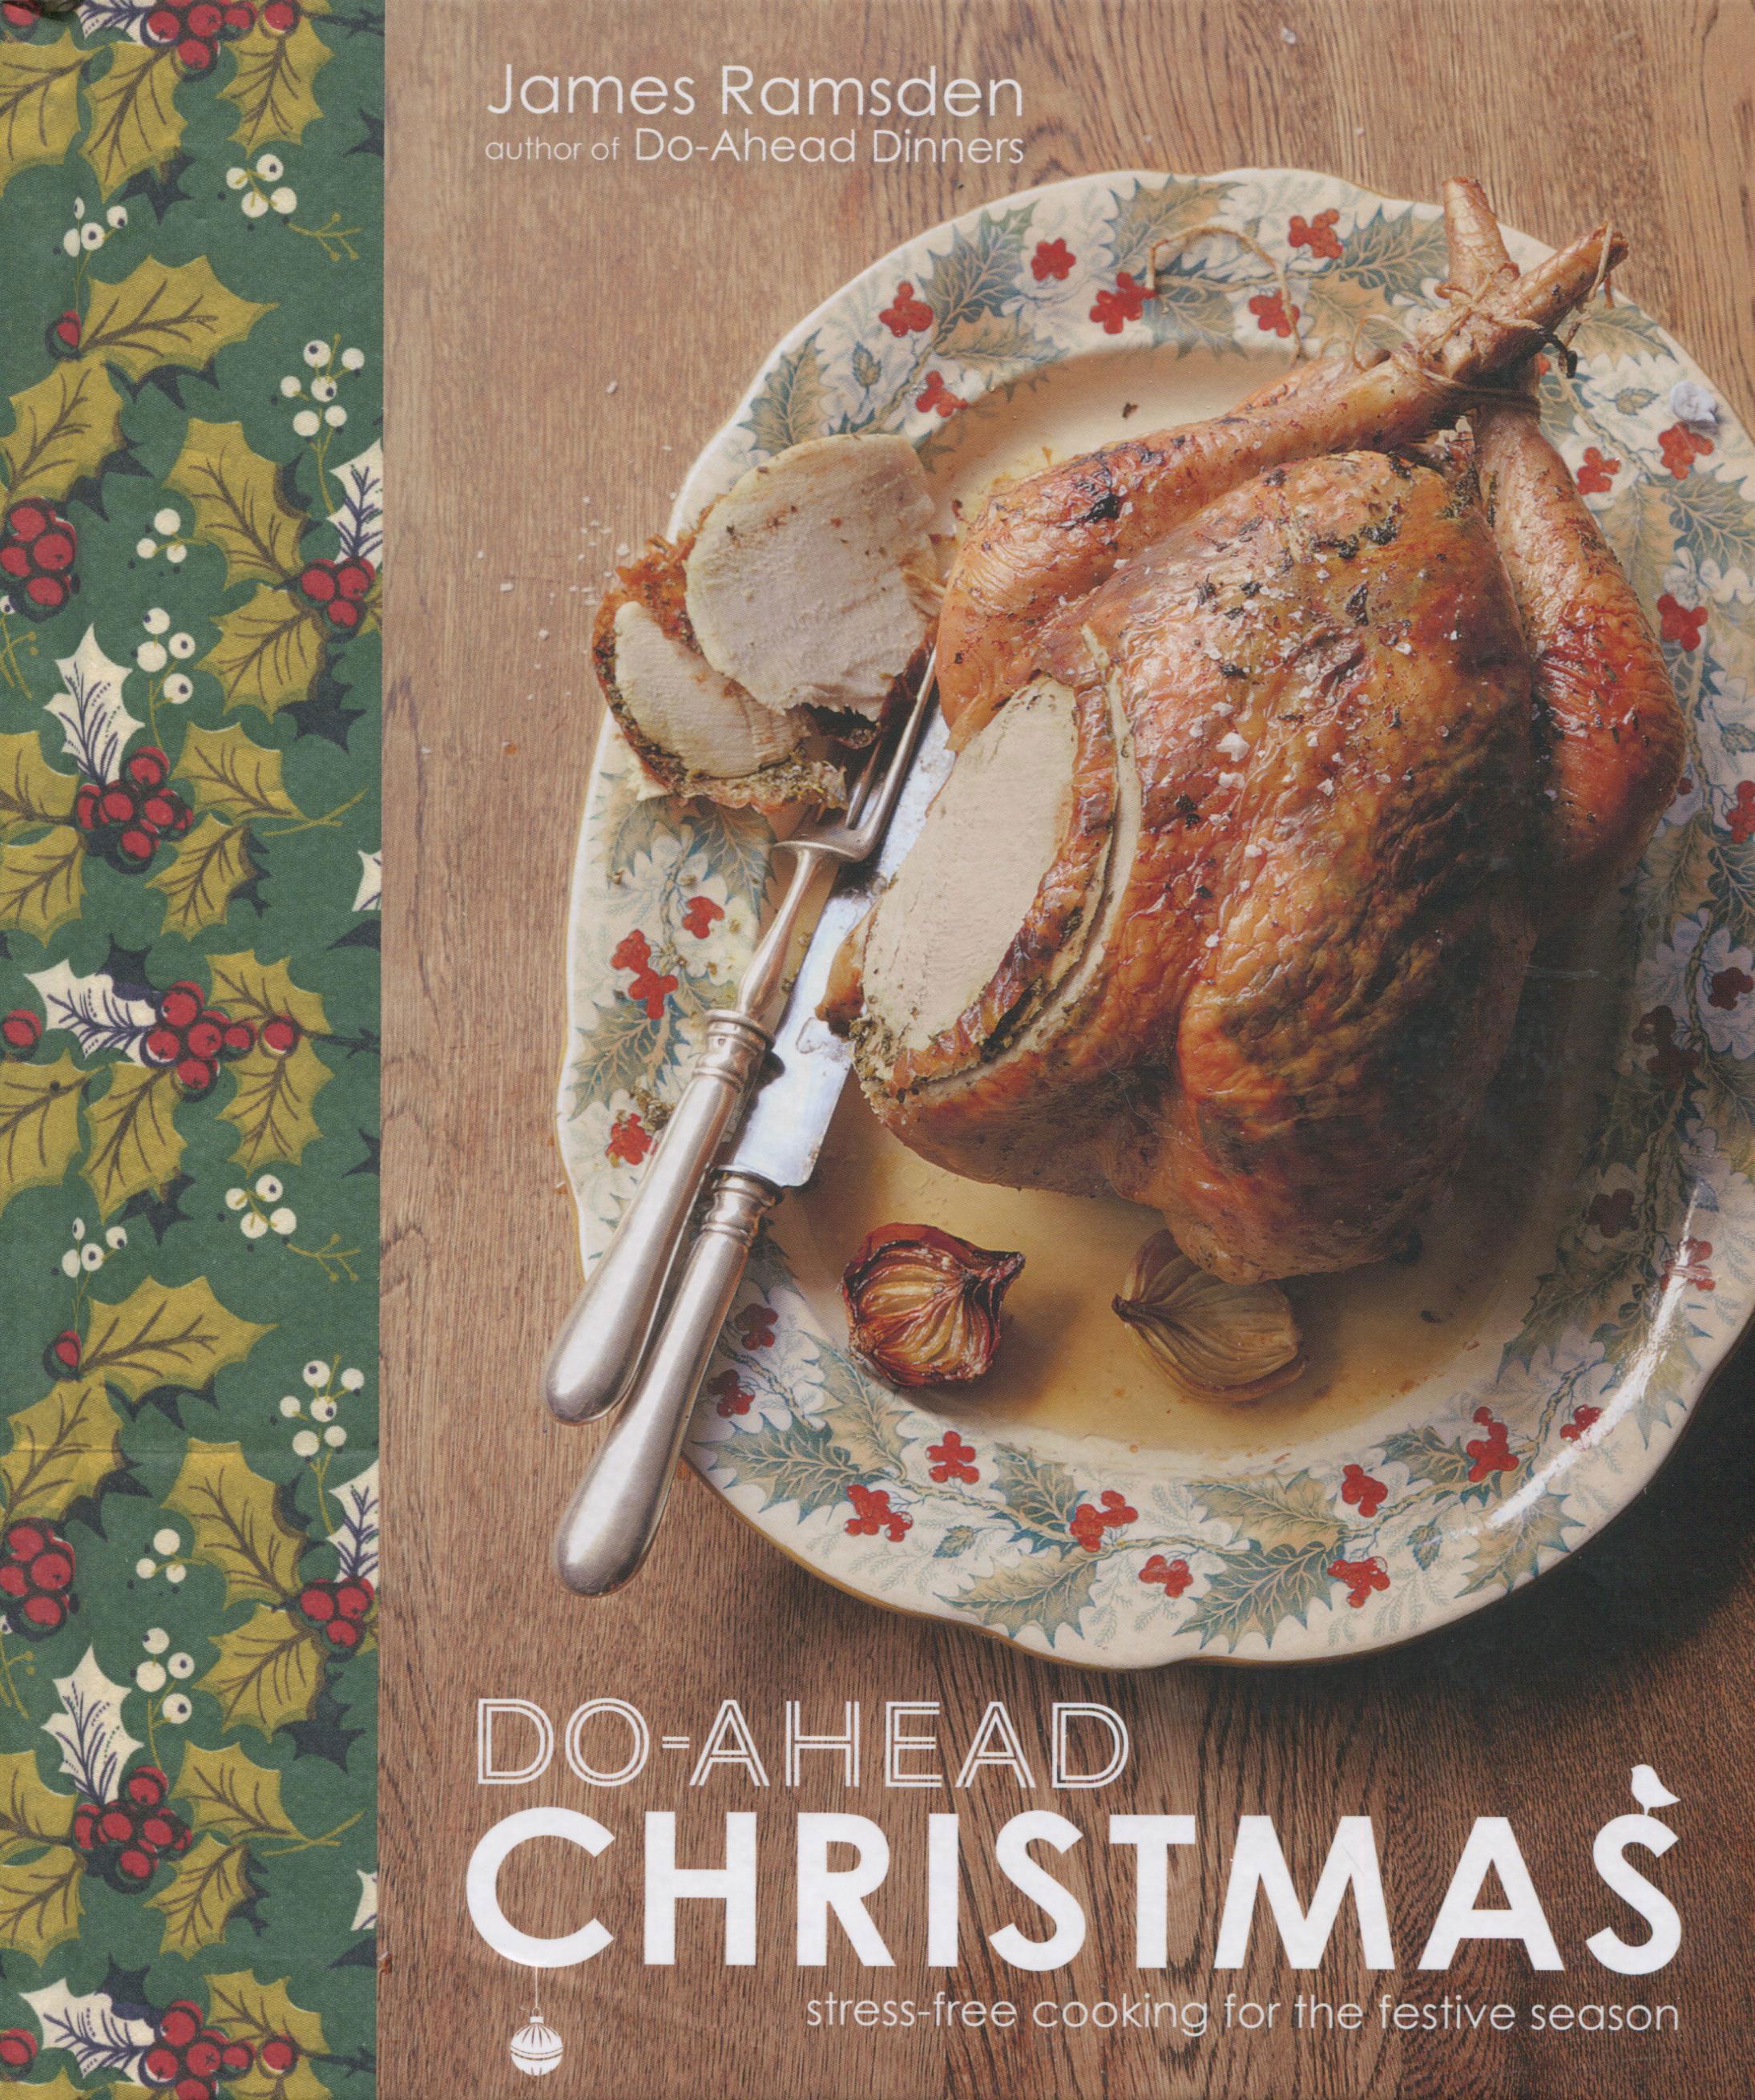 TBT Cookbook Review: Do-Ahead Christmas